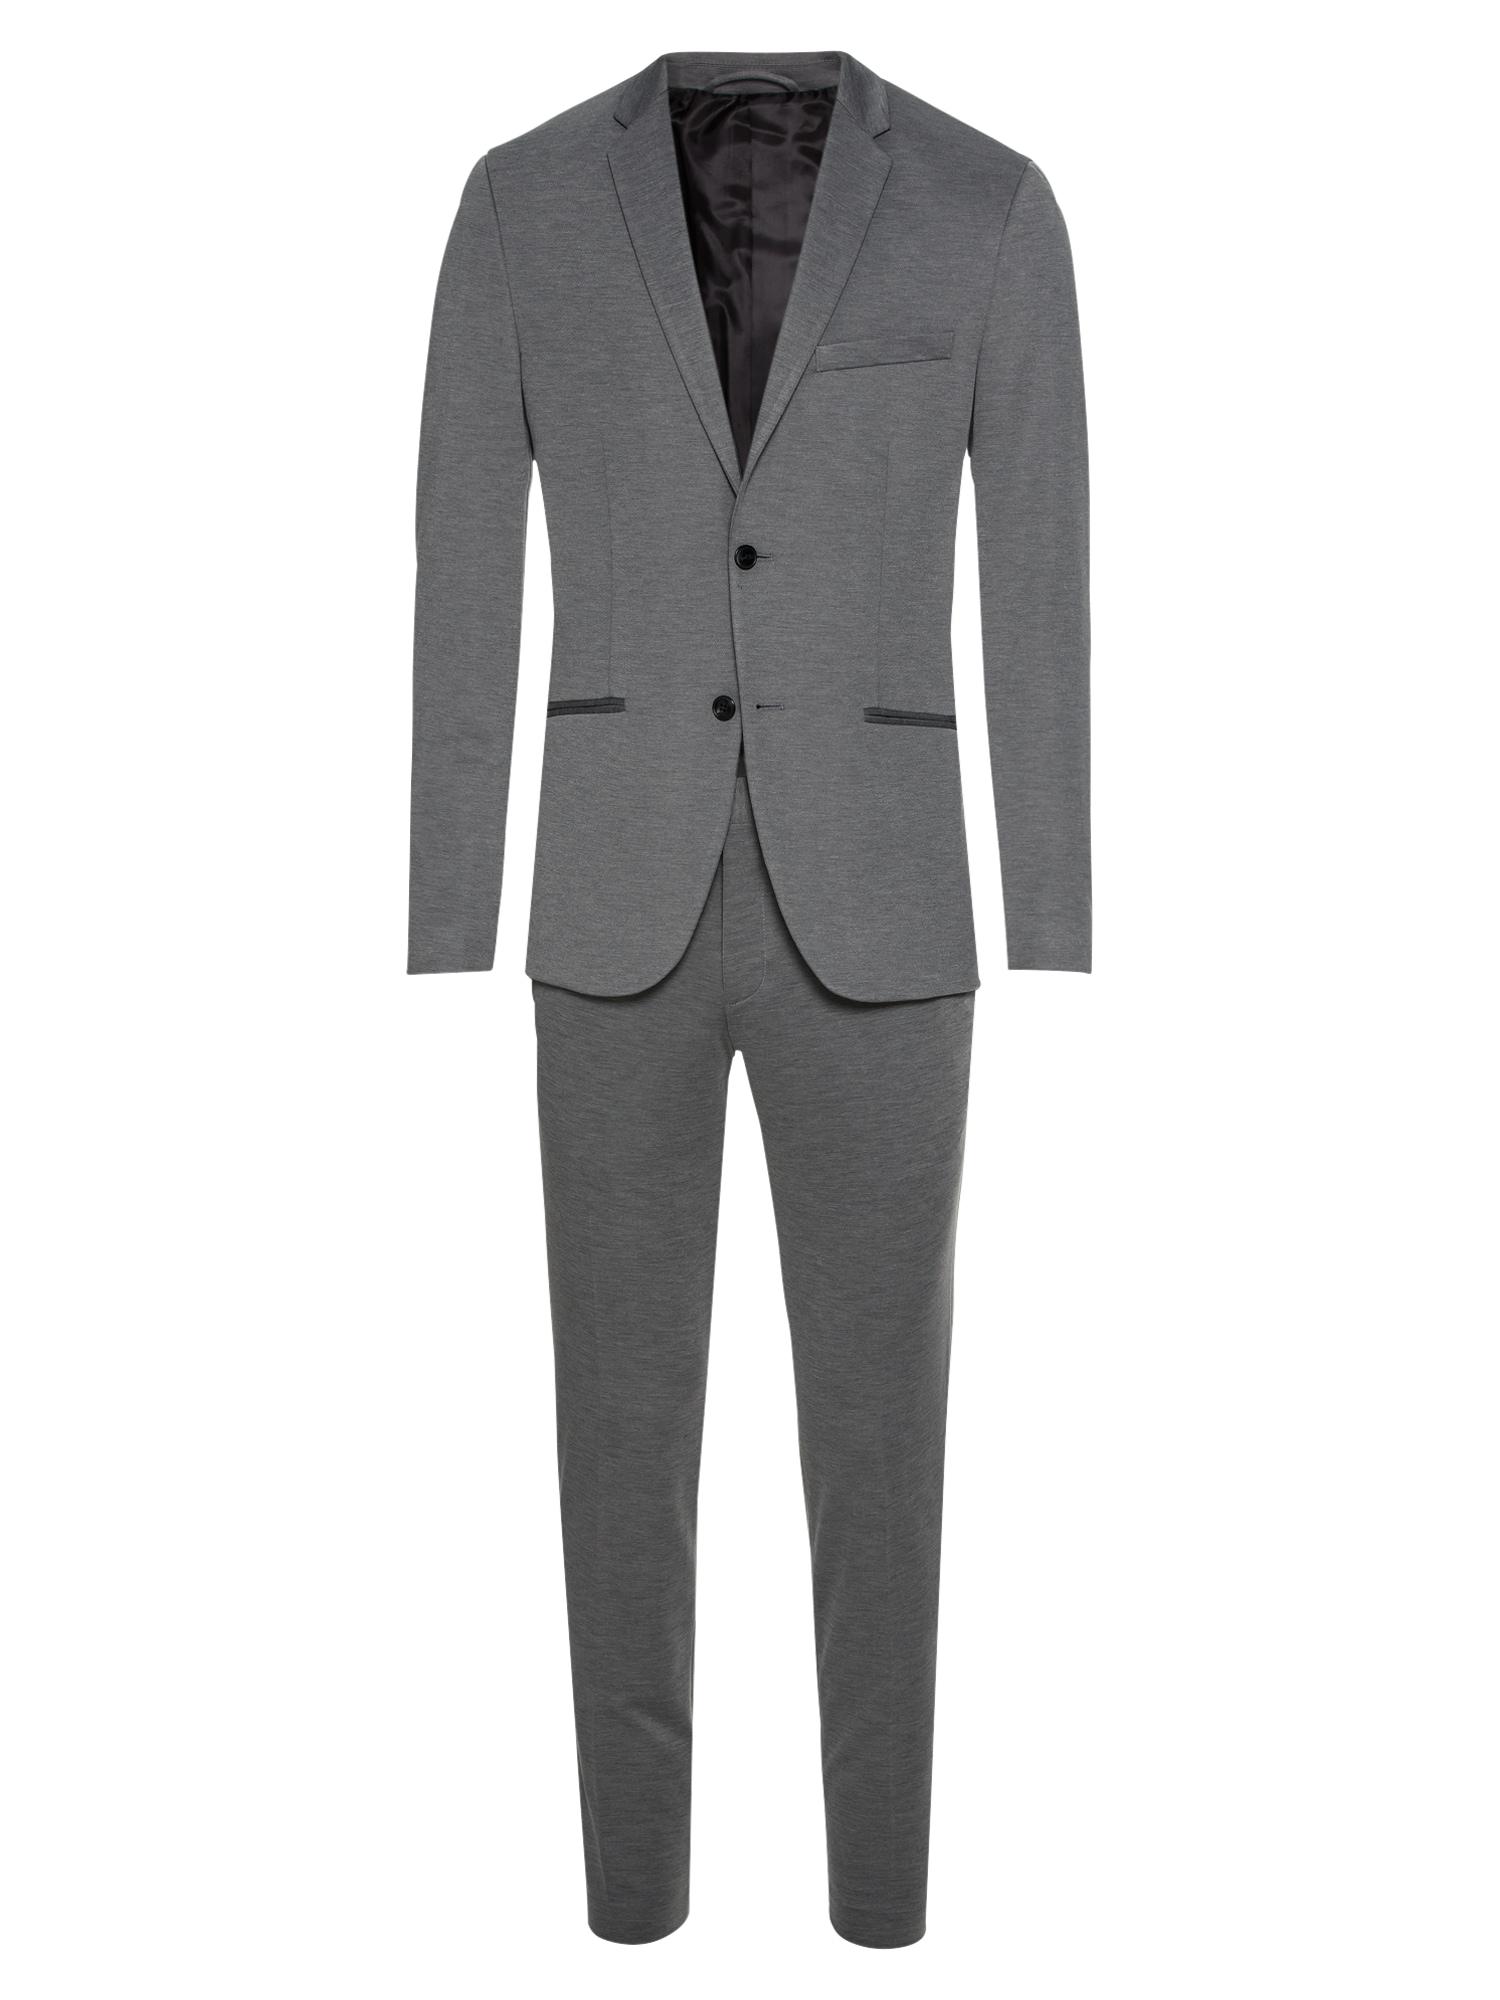 Oblek JPRSTEVEN SUIT šedý melír JACK & JONES